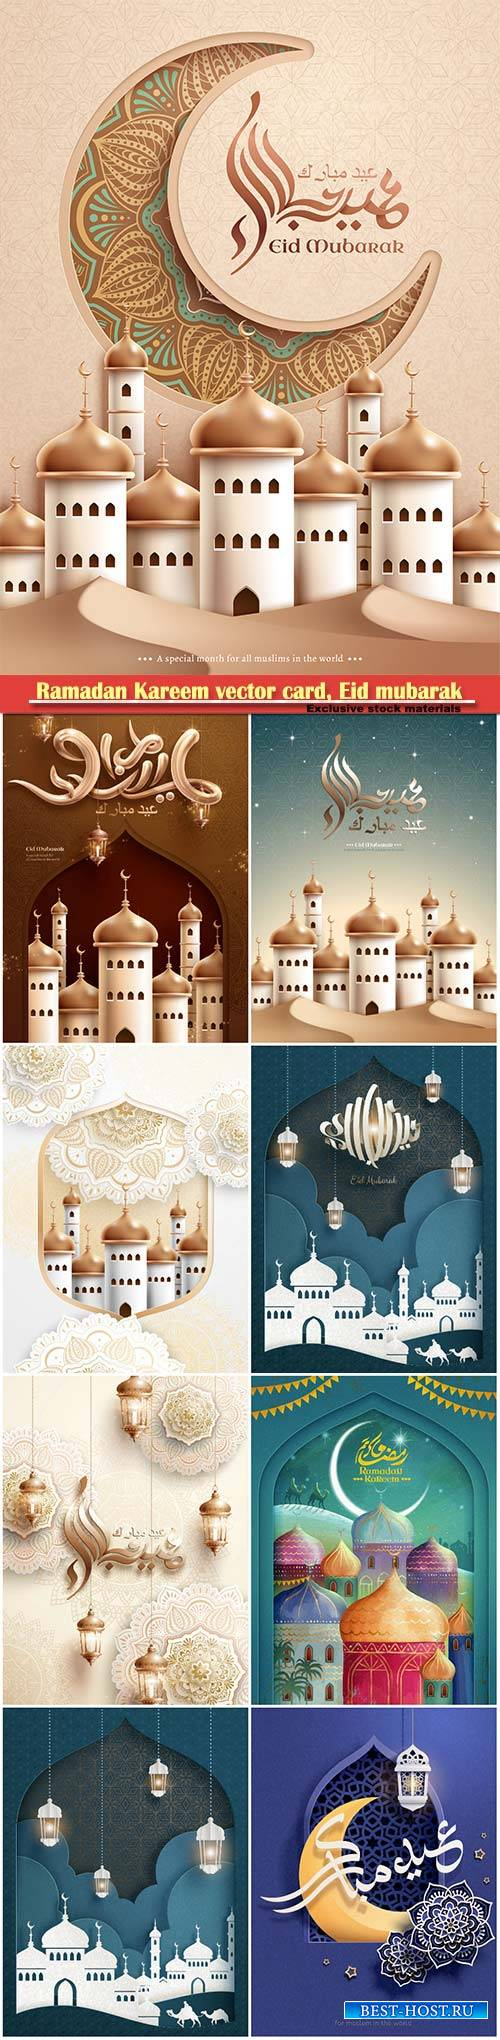 Ramadan Kareem vector card, Eid mubarak calligraphy design templates # 4